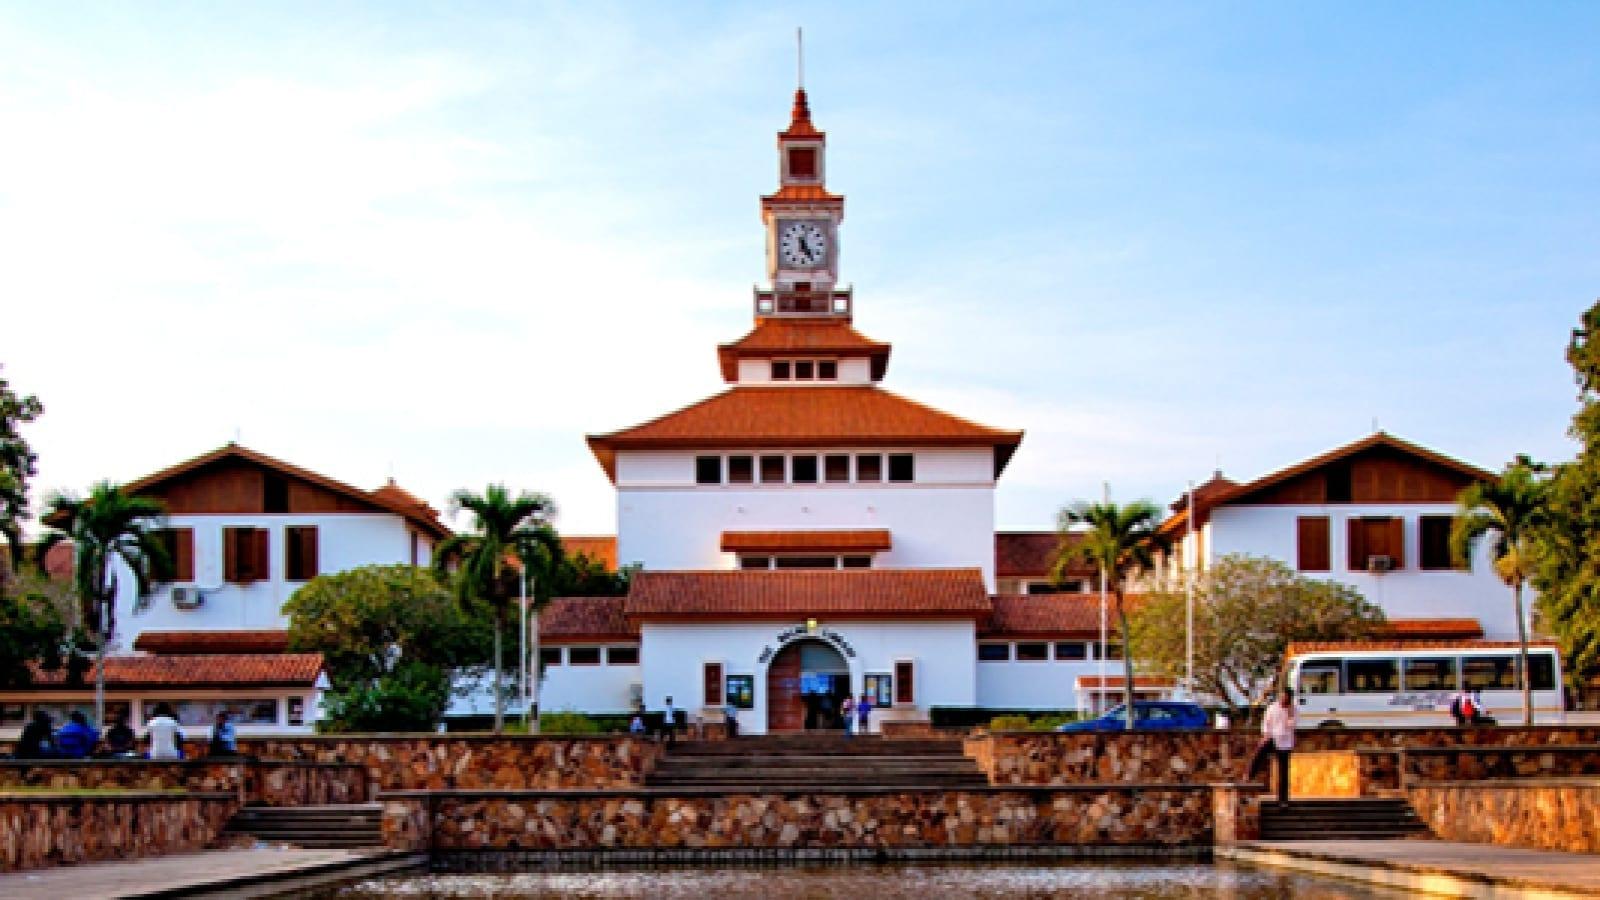 Gov't to open new university